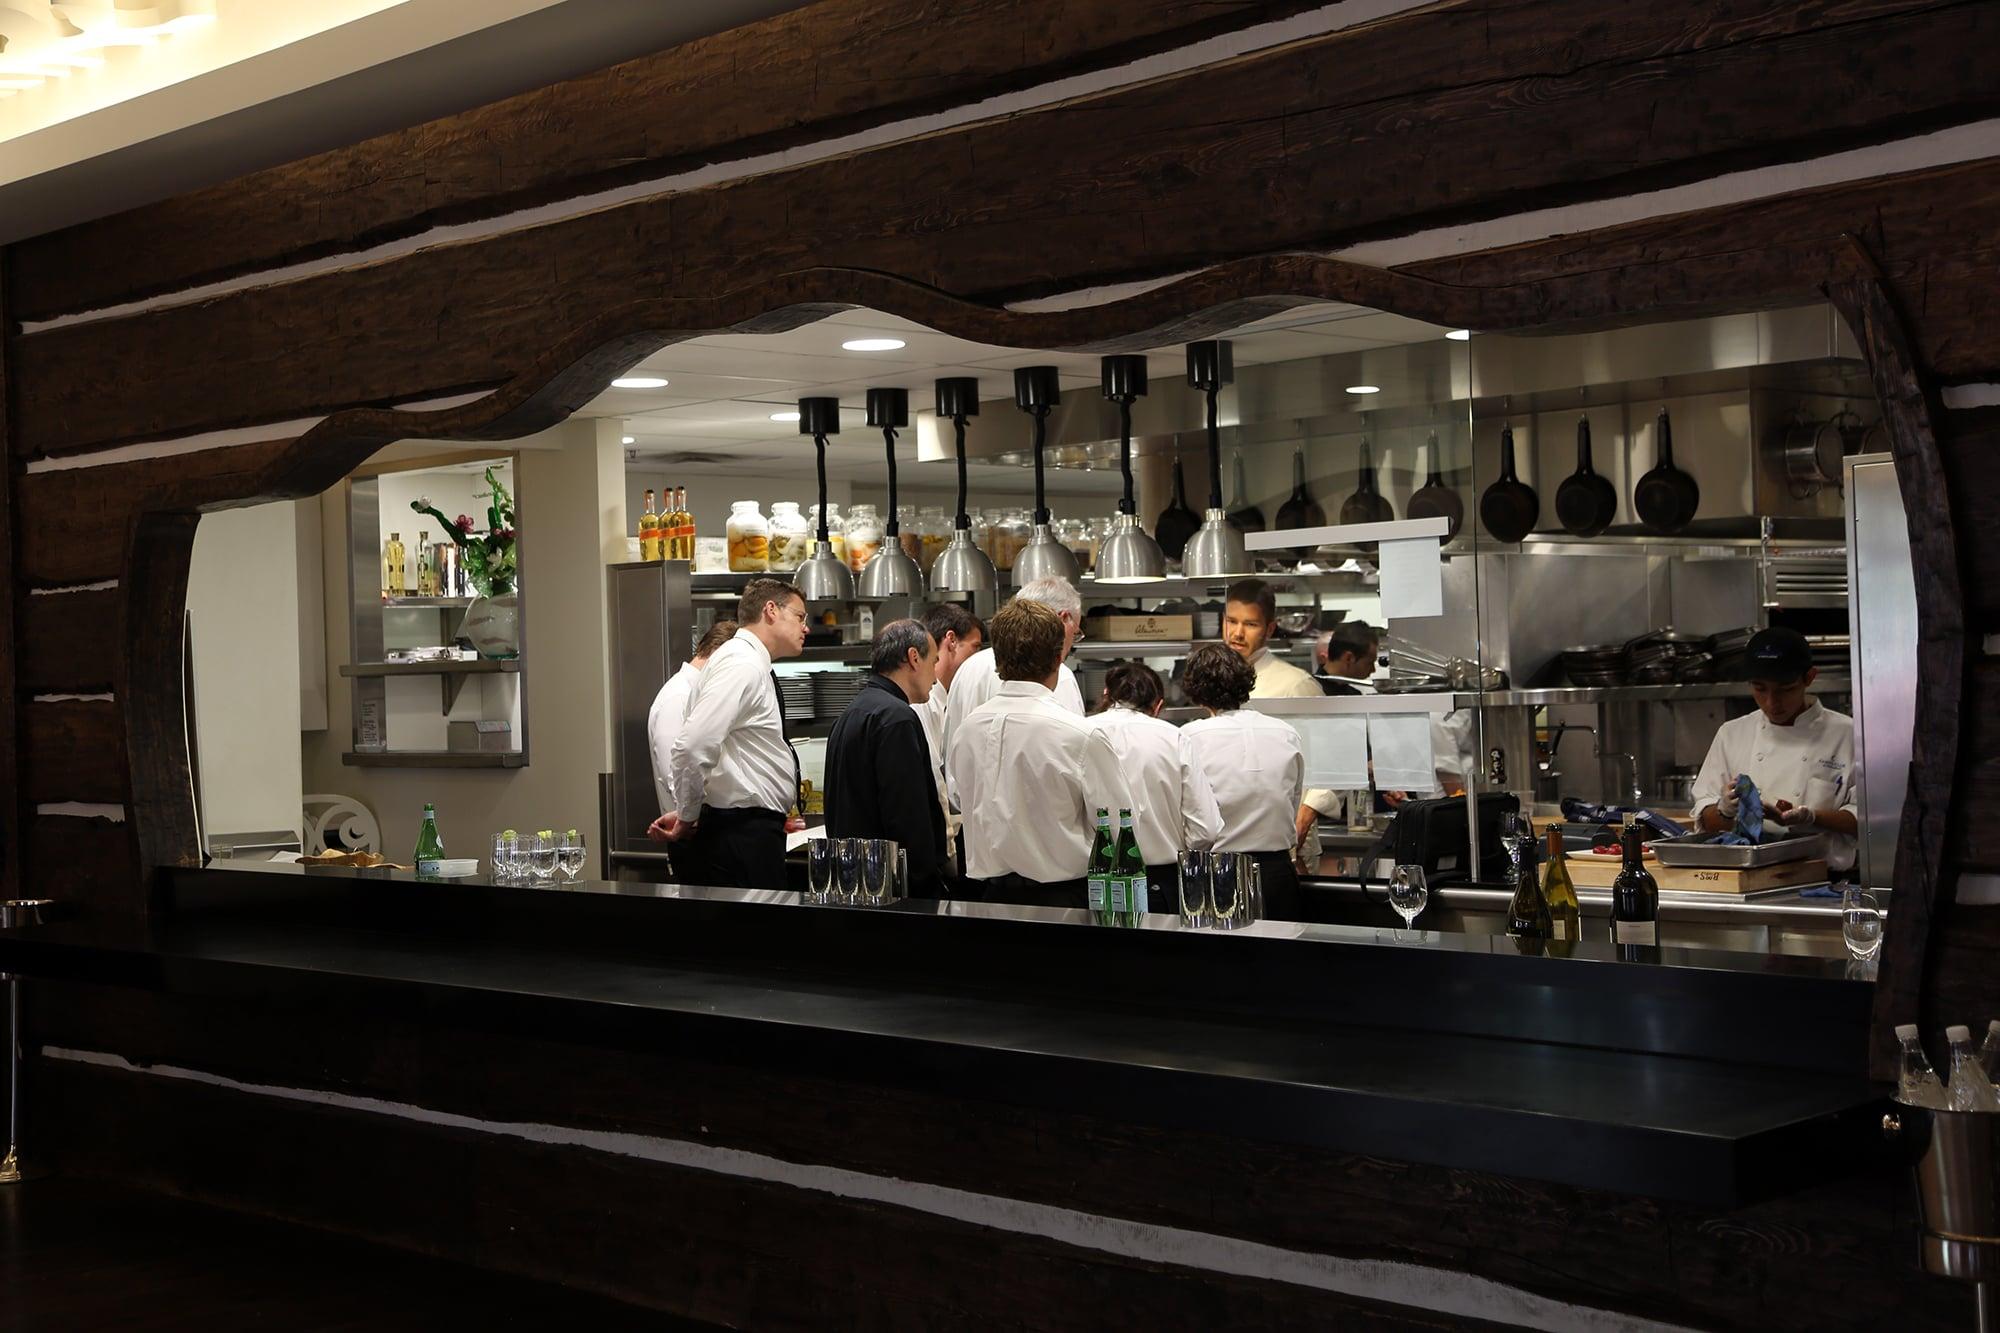 Thursday: St. Regis Chefs Club